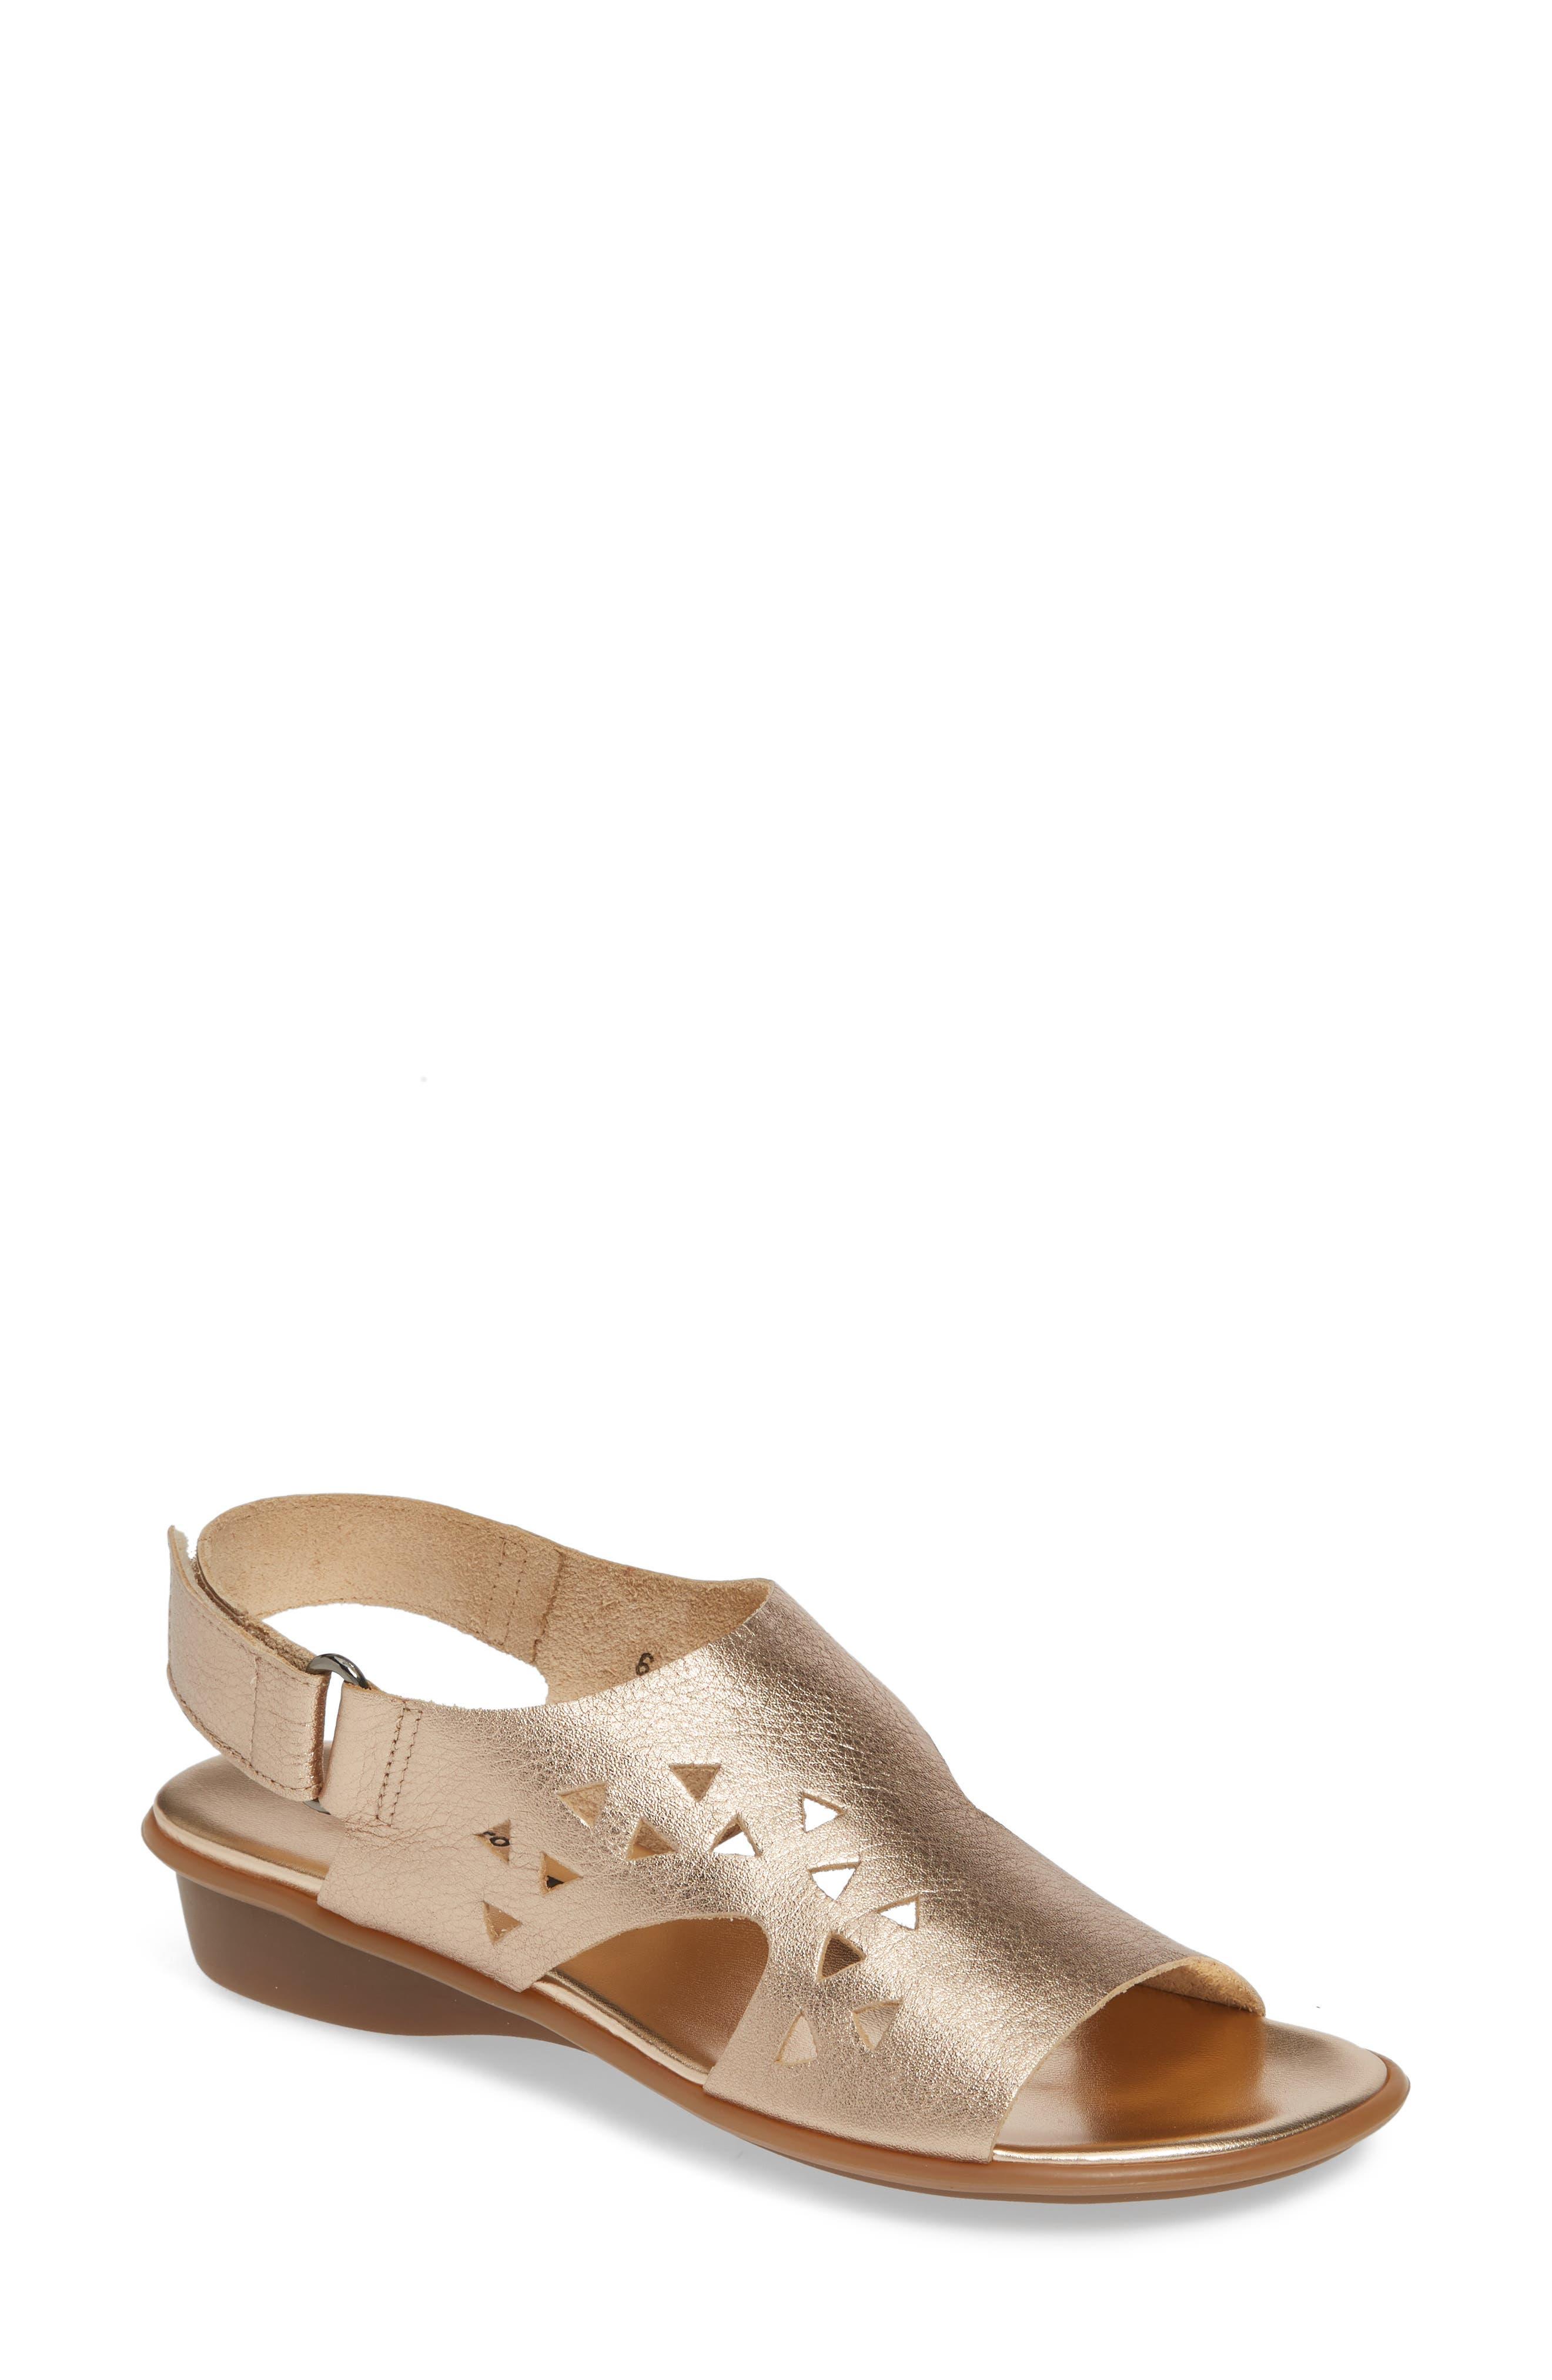 29b57d091a3 Women s Sesto Meucci Shoes